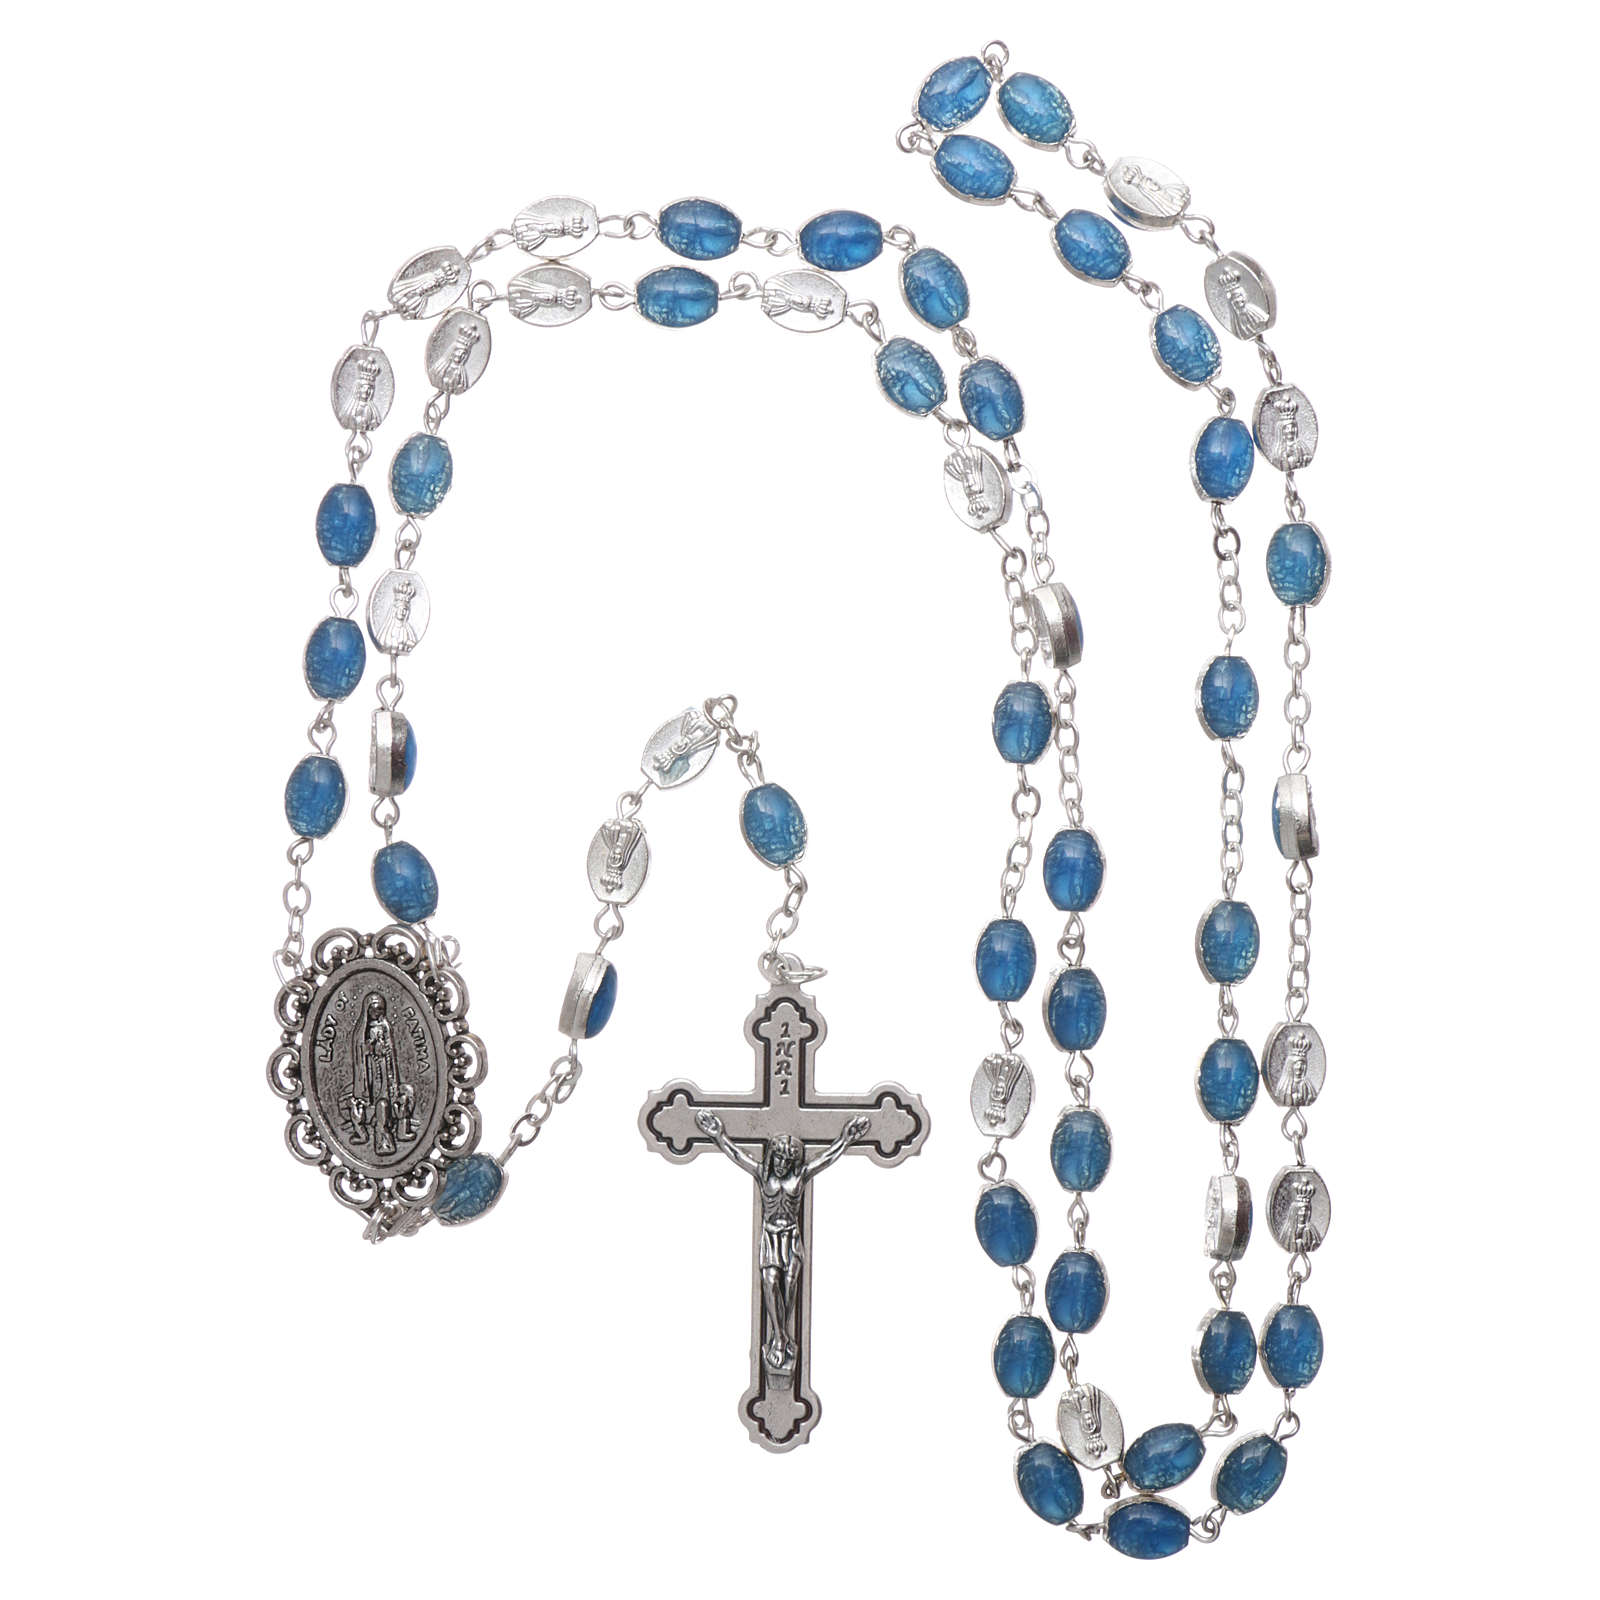 Chapelet métal Fatima terre 6x4 mm émail bleu 4